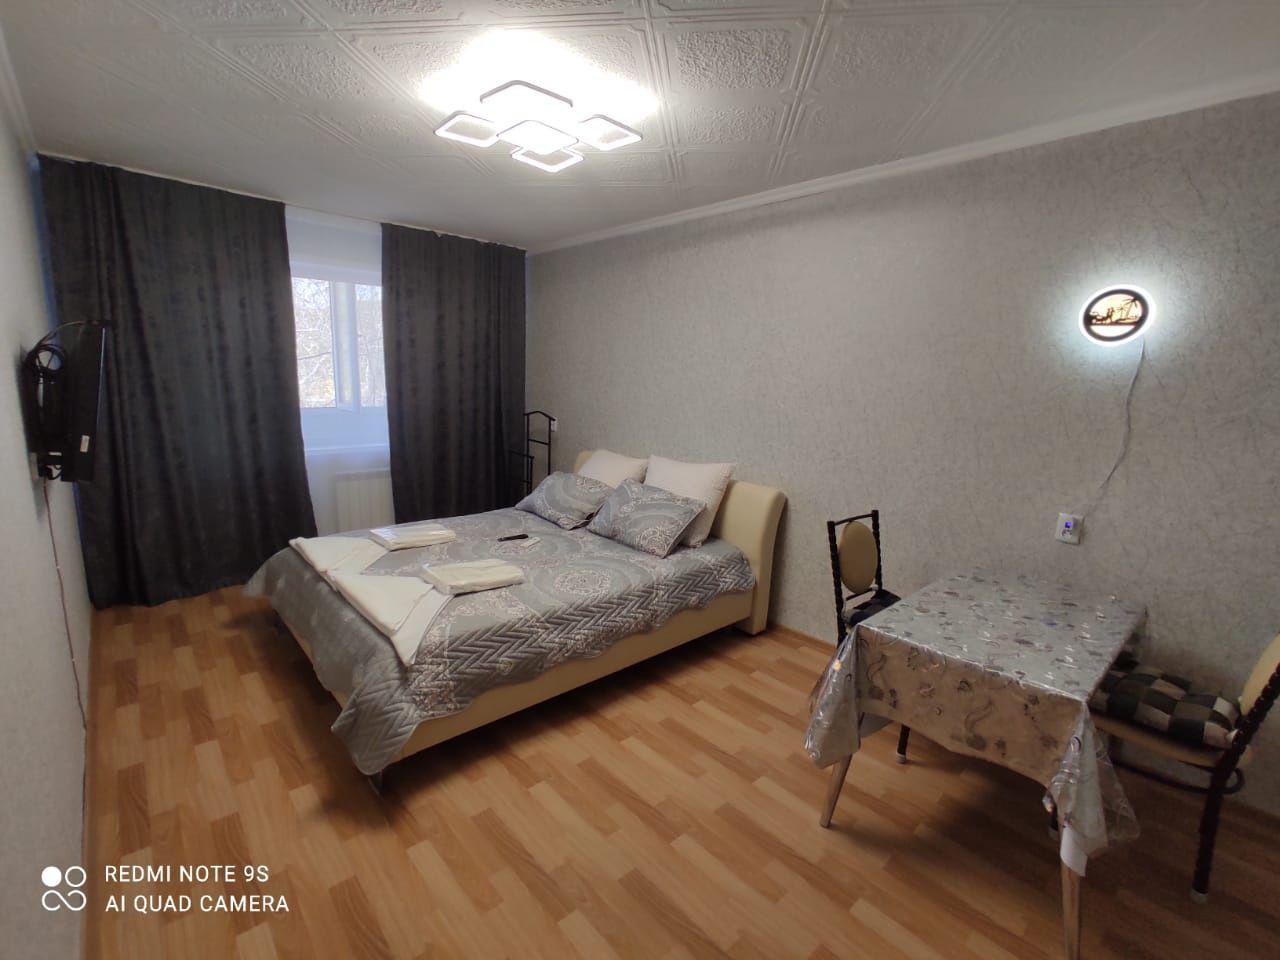 Сдам уютную 1-ком. квартиру в центре рядом Kазахтелеком, MAXI MALL